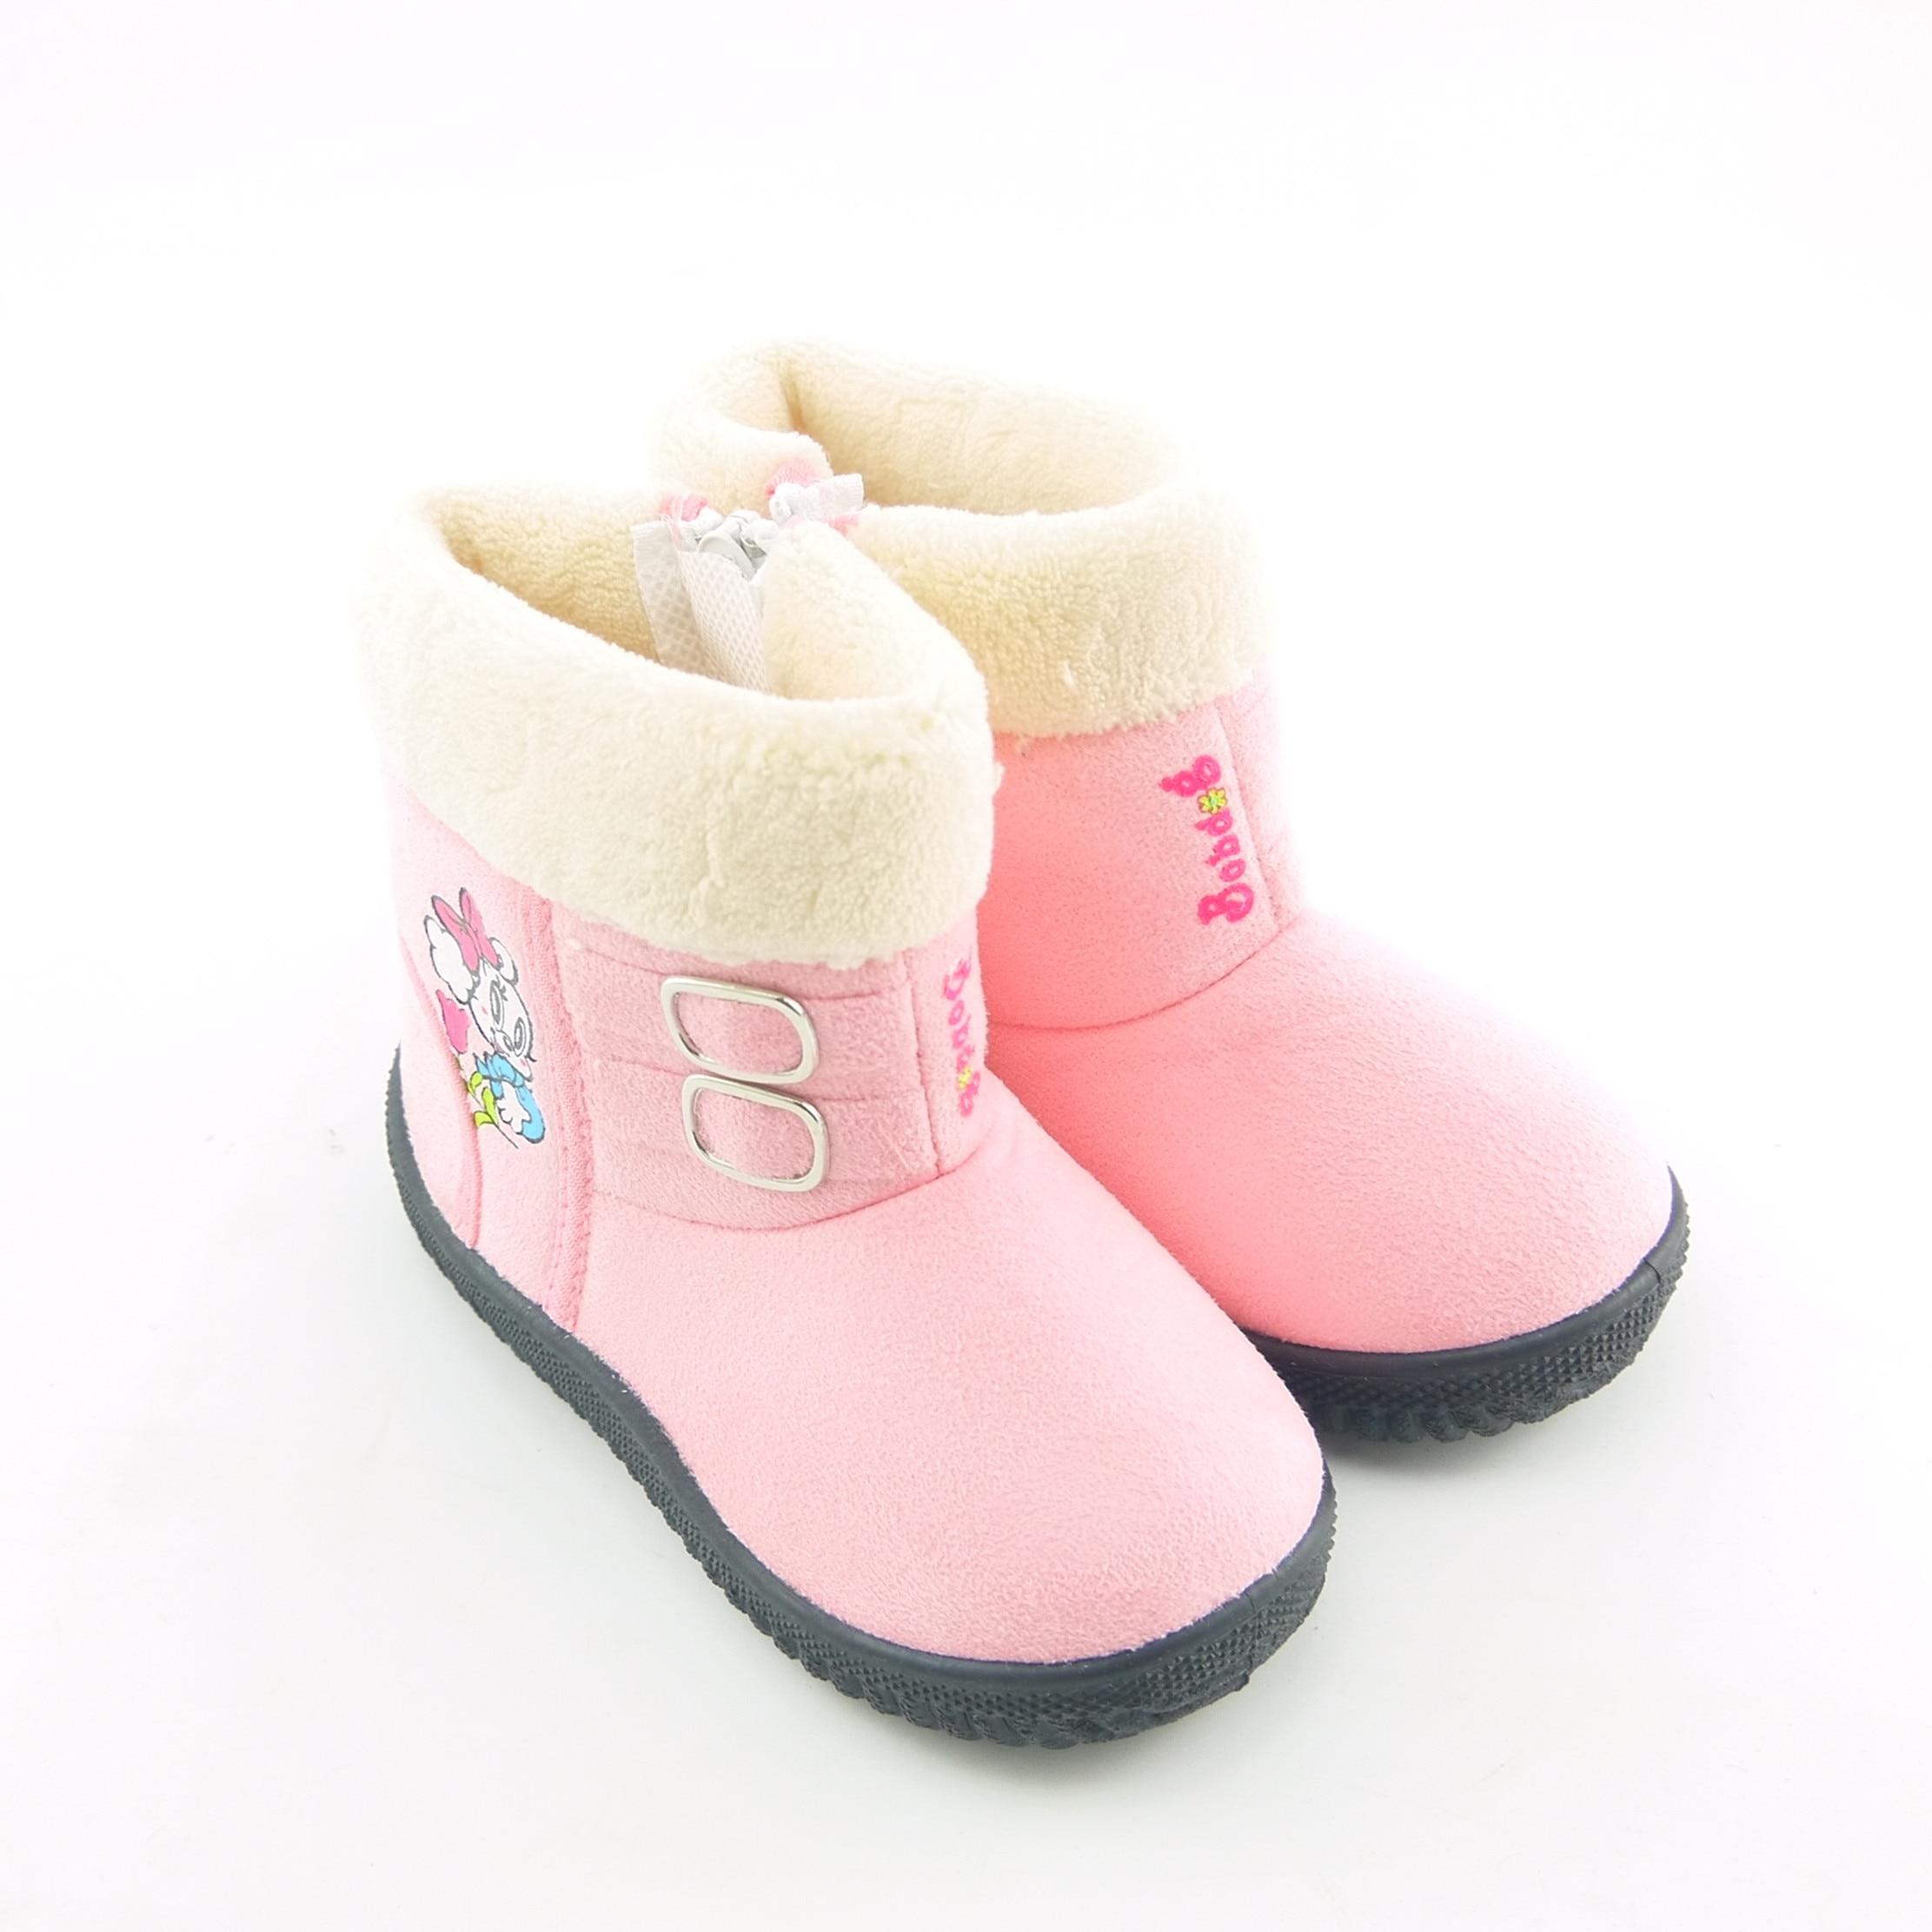 Koovan Baby Shoes 2019 Winter Warm Children Boots Dog Cartoon Cotton Girls Snow Boot Boys Girls Kids Rubber Shoes 23-27